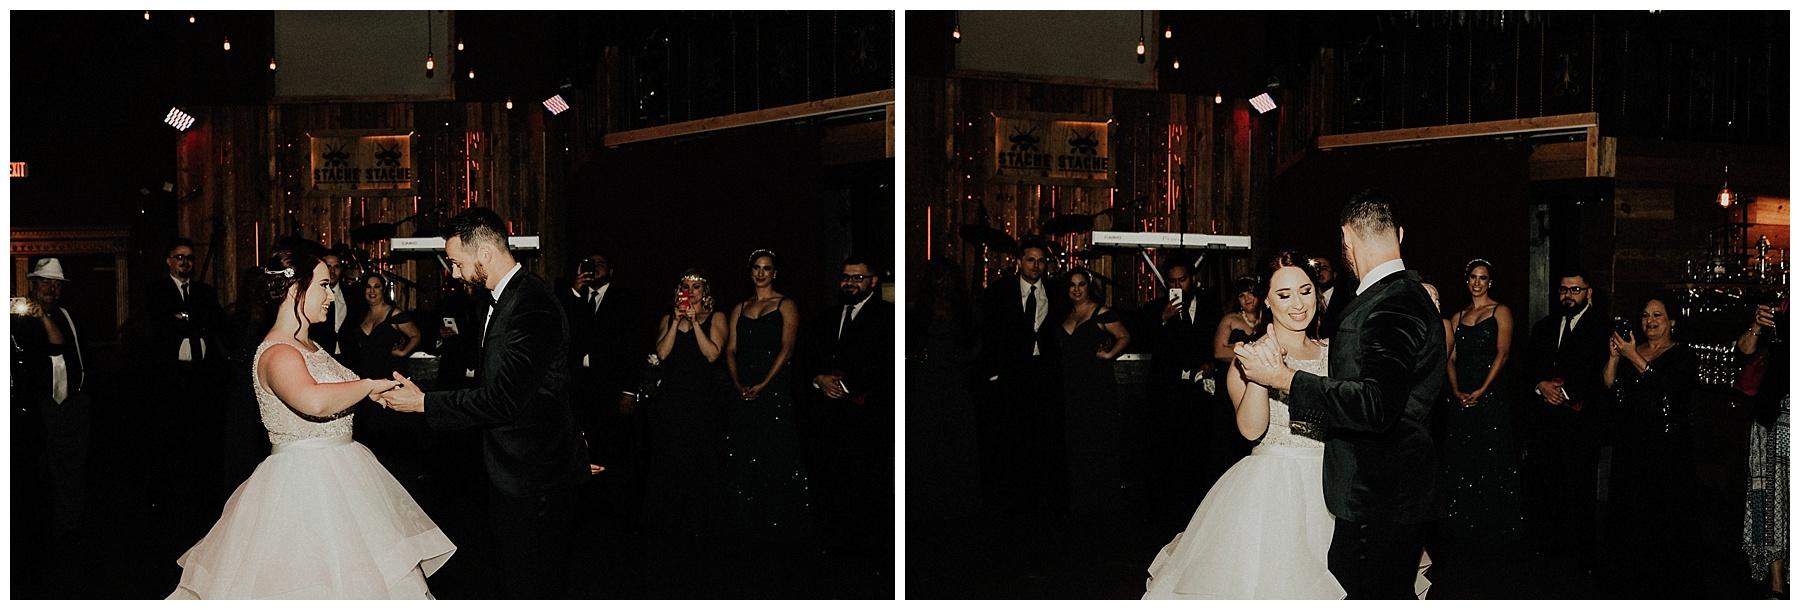 Fort Lauderdale Wedding Tampa Wedding Photographer-134.jpg